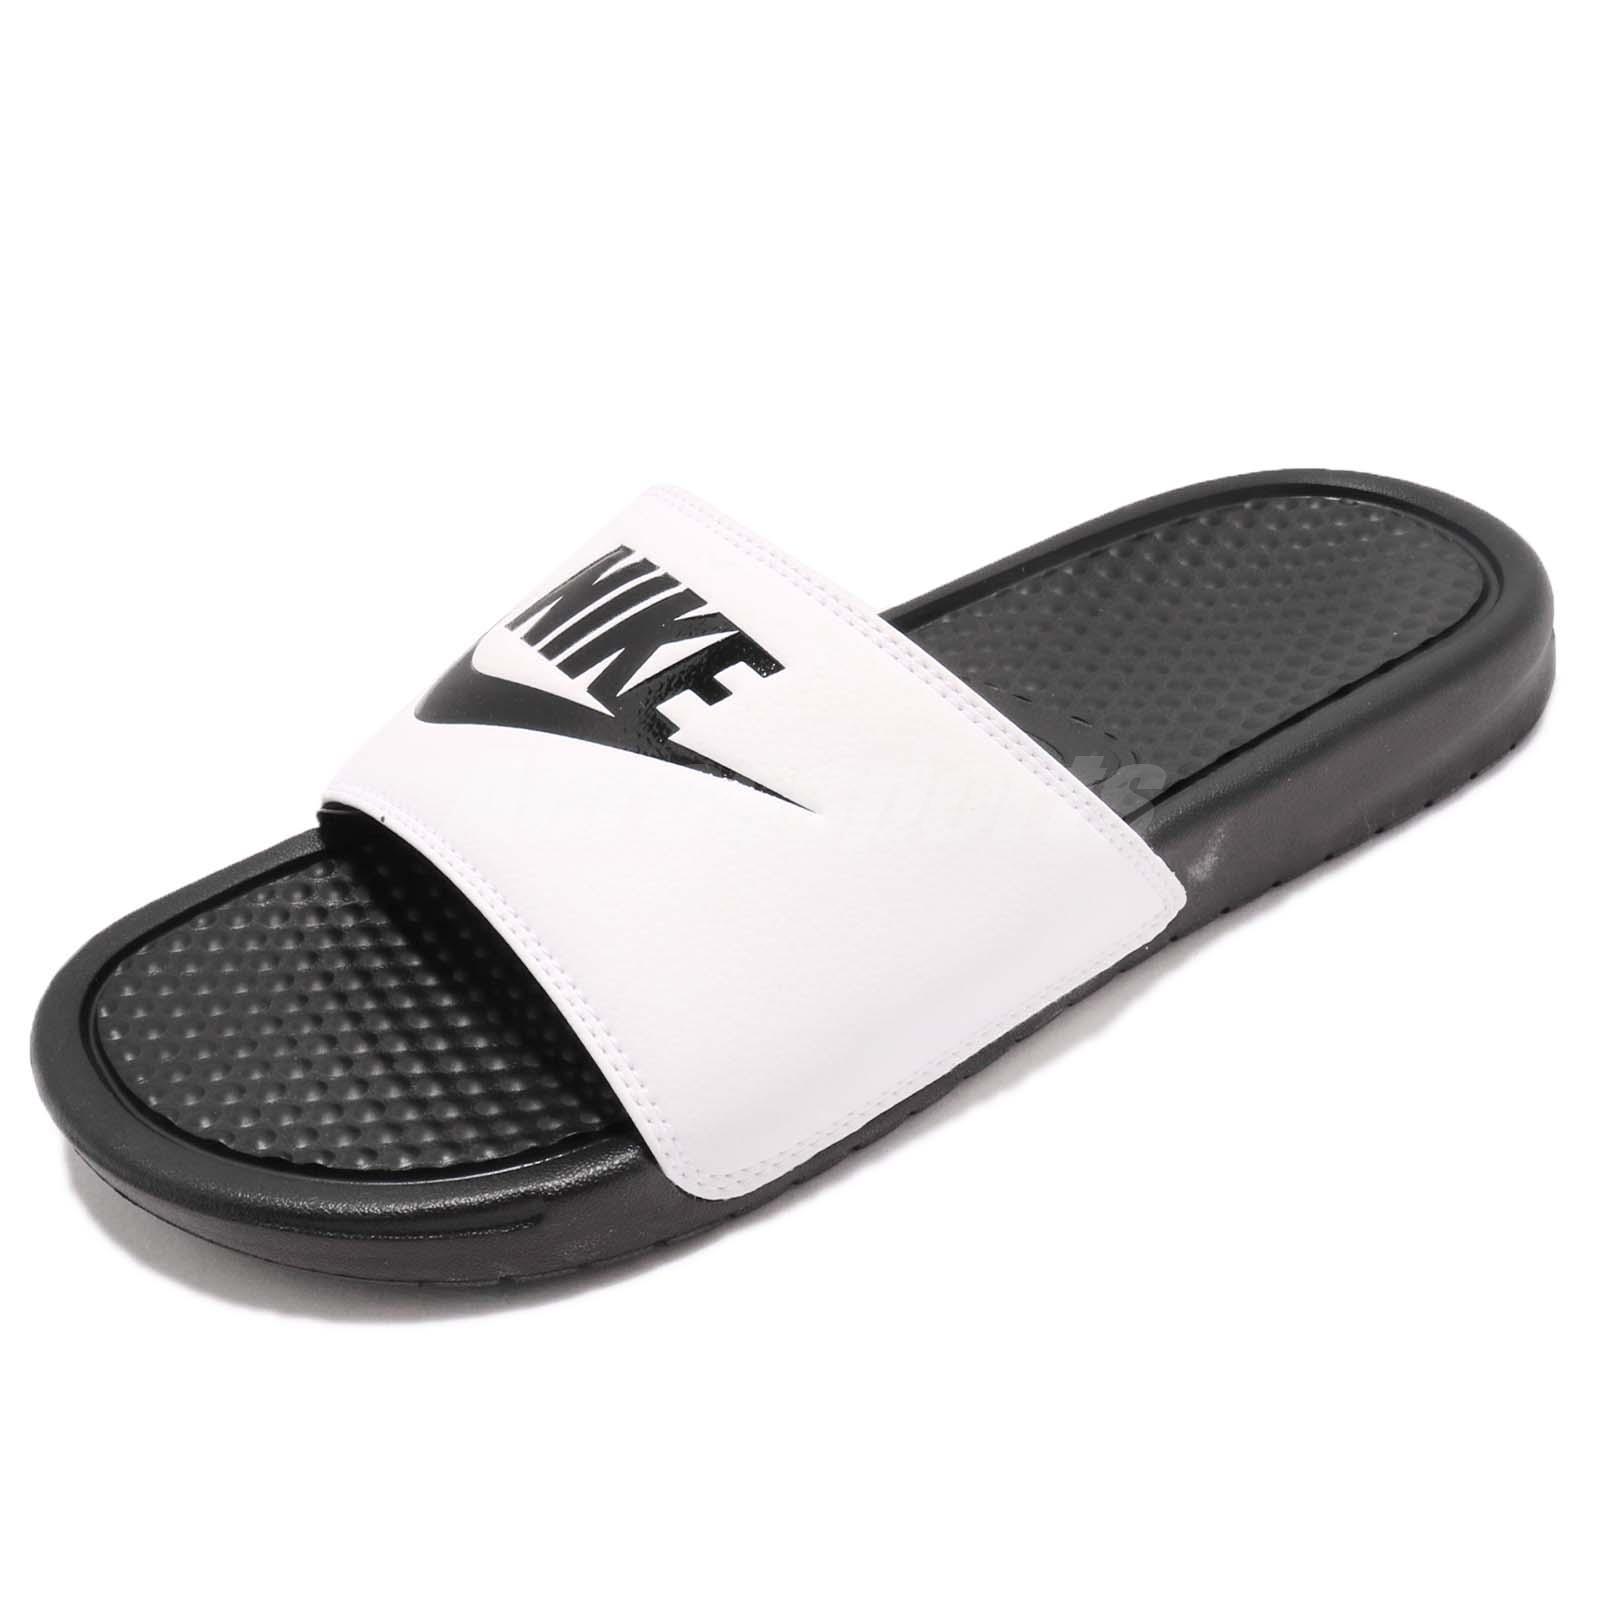 63c7242b4453 Details about Nike Benassi JDI LOGO White Black Men Sports Sandal Slides  Slippers 343880-100